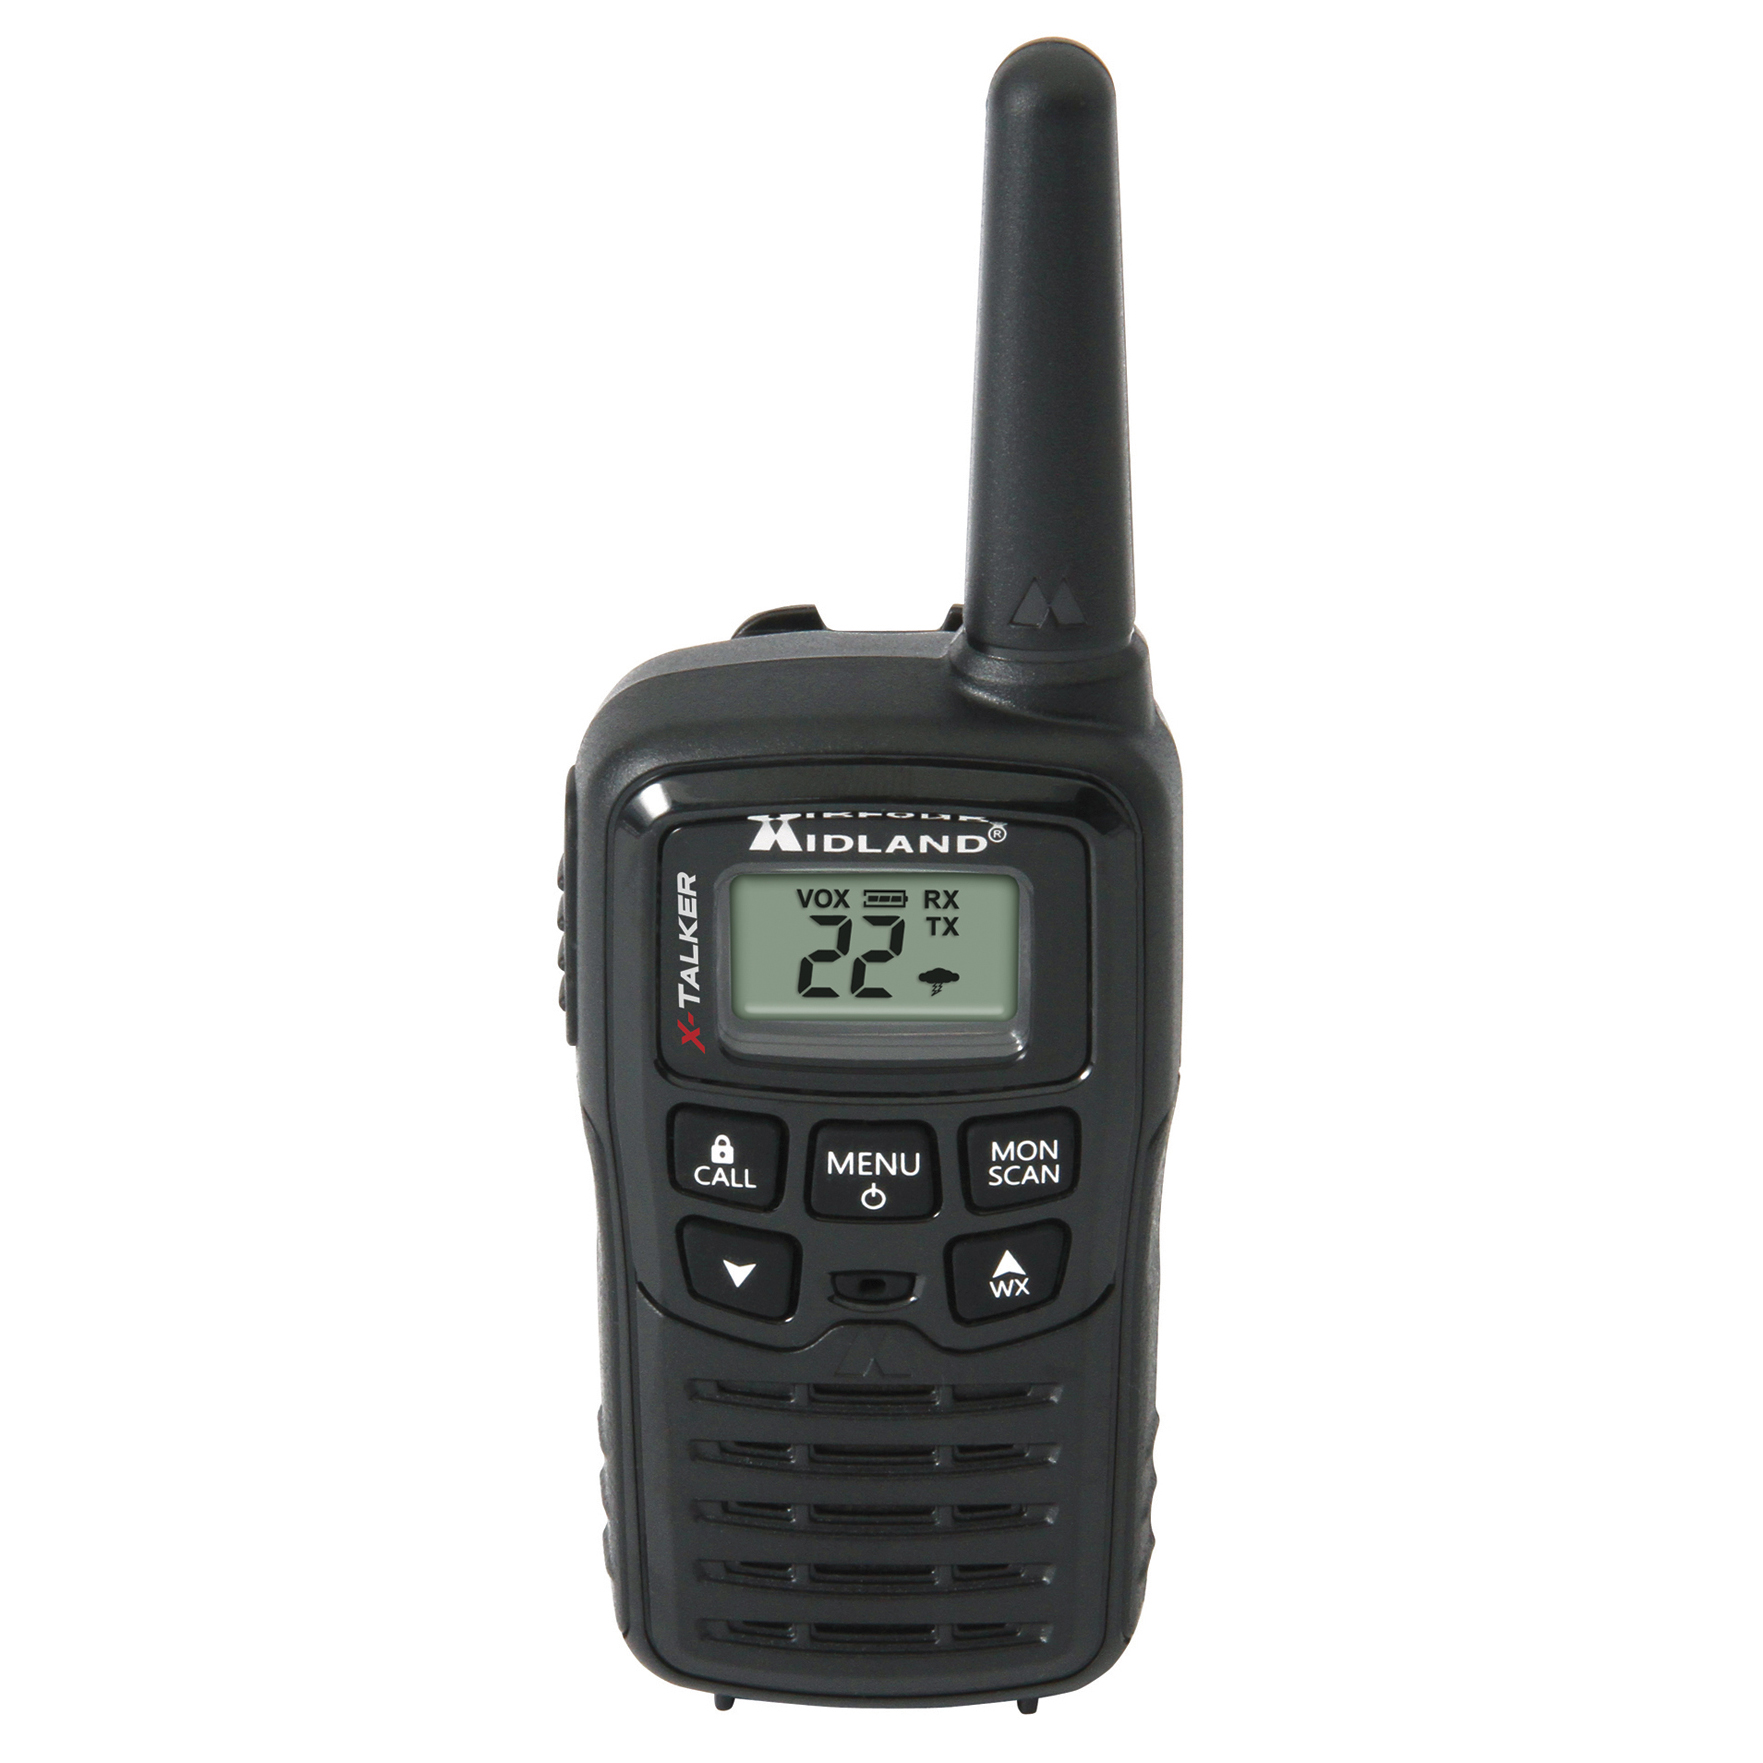 Midland X-Talker T10 Two-Way Radios